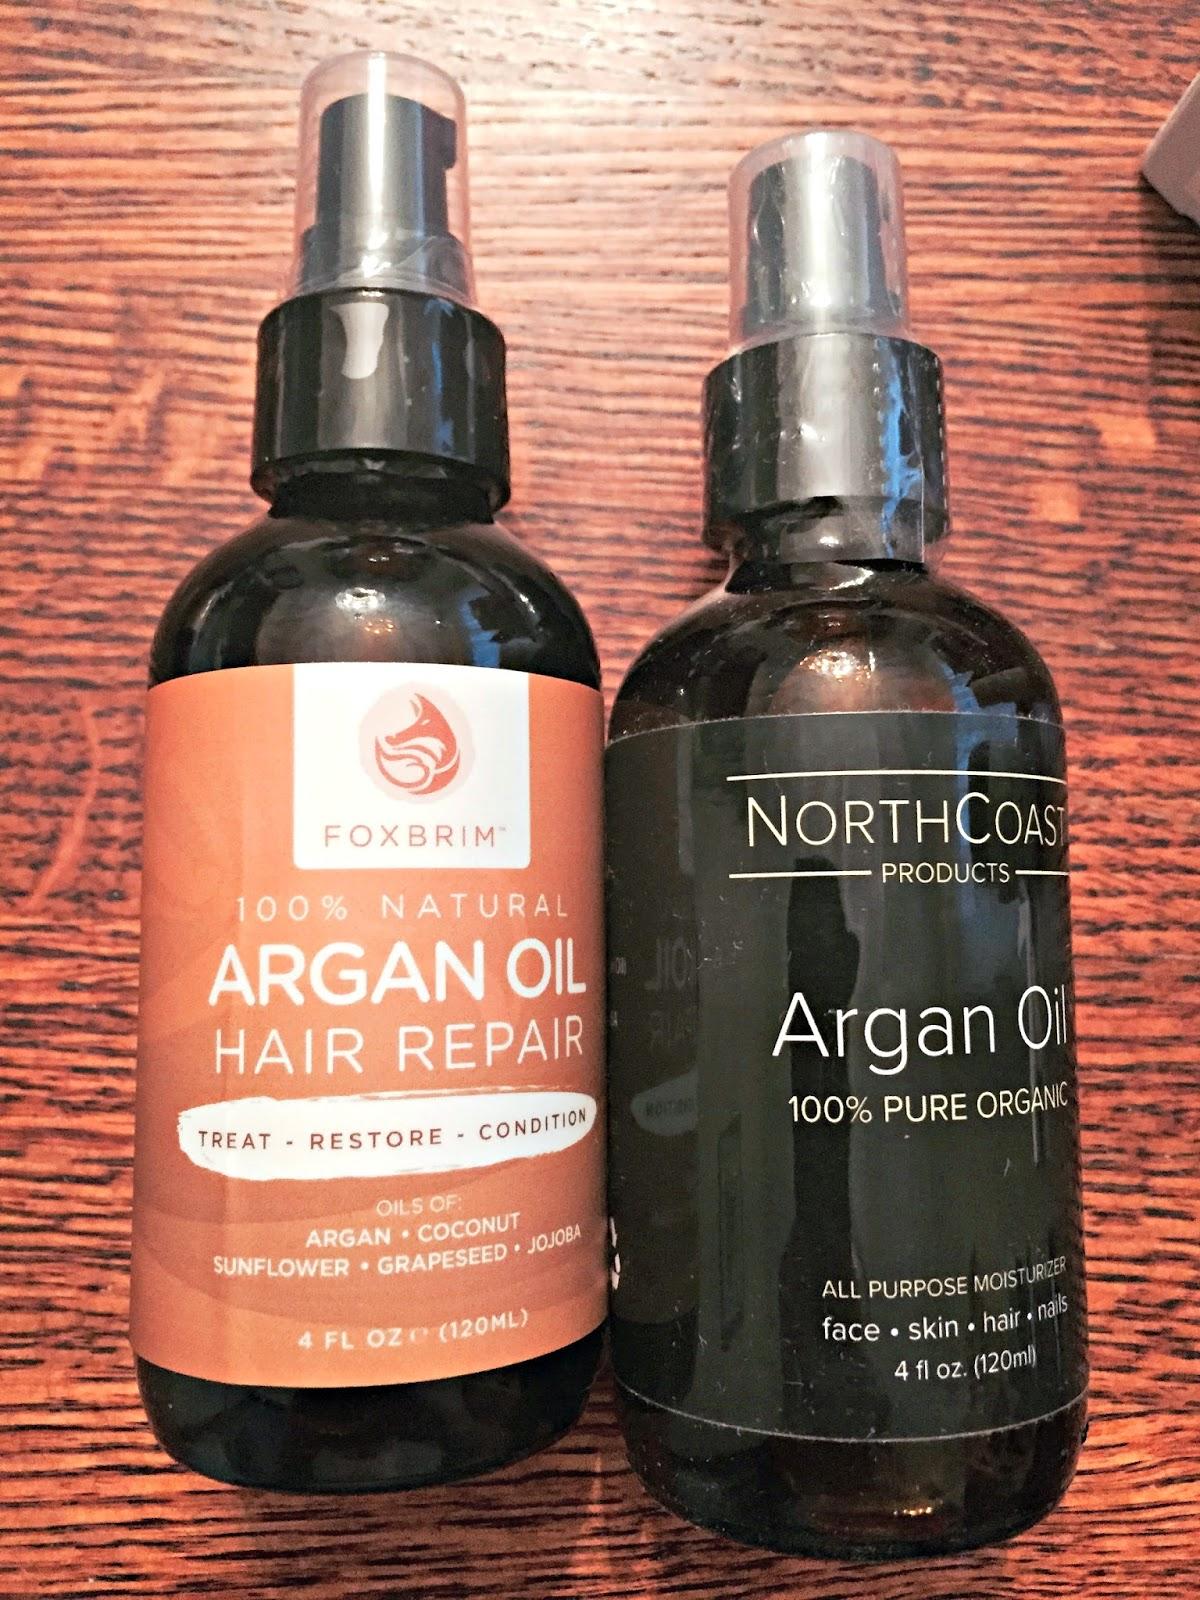 north-coast-products-foxbrim-argan-oil